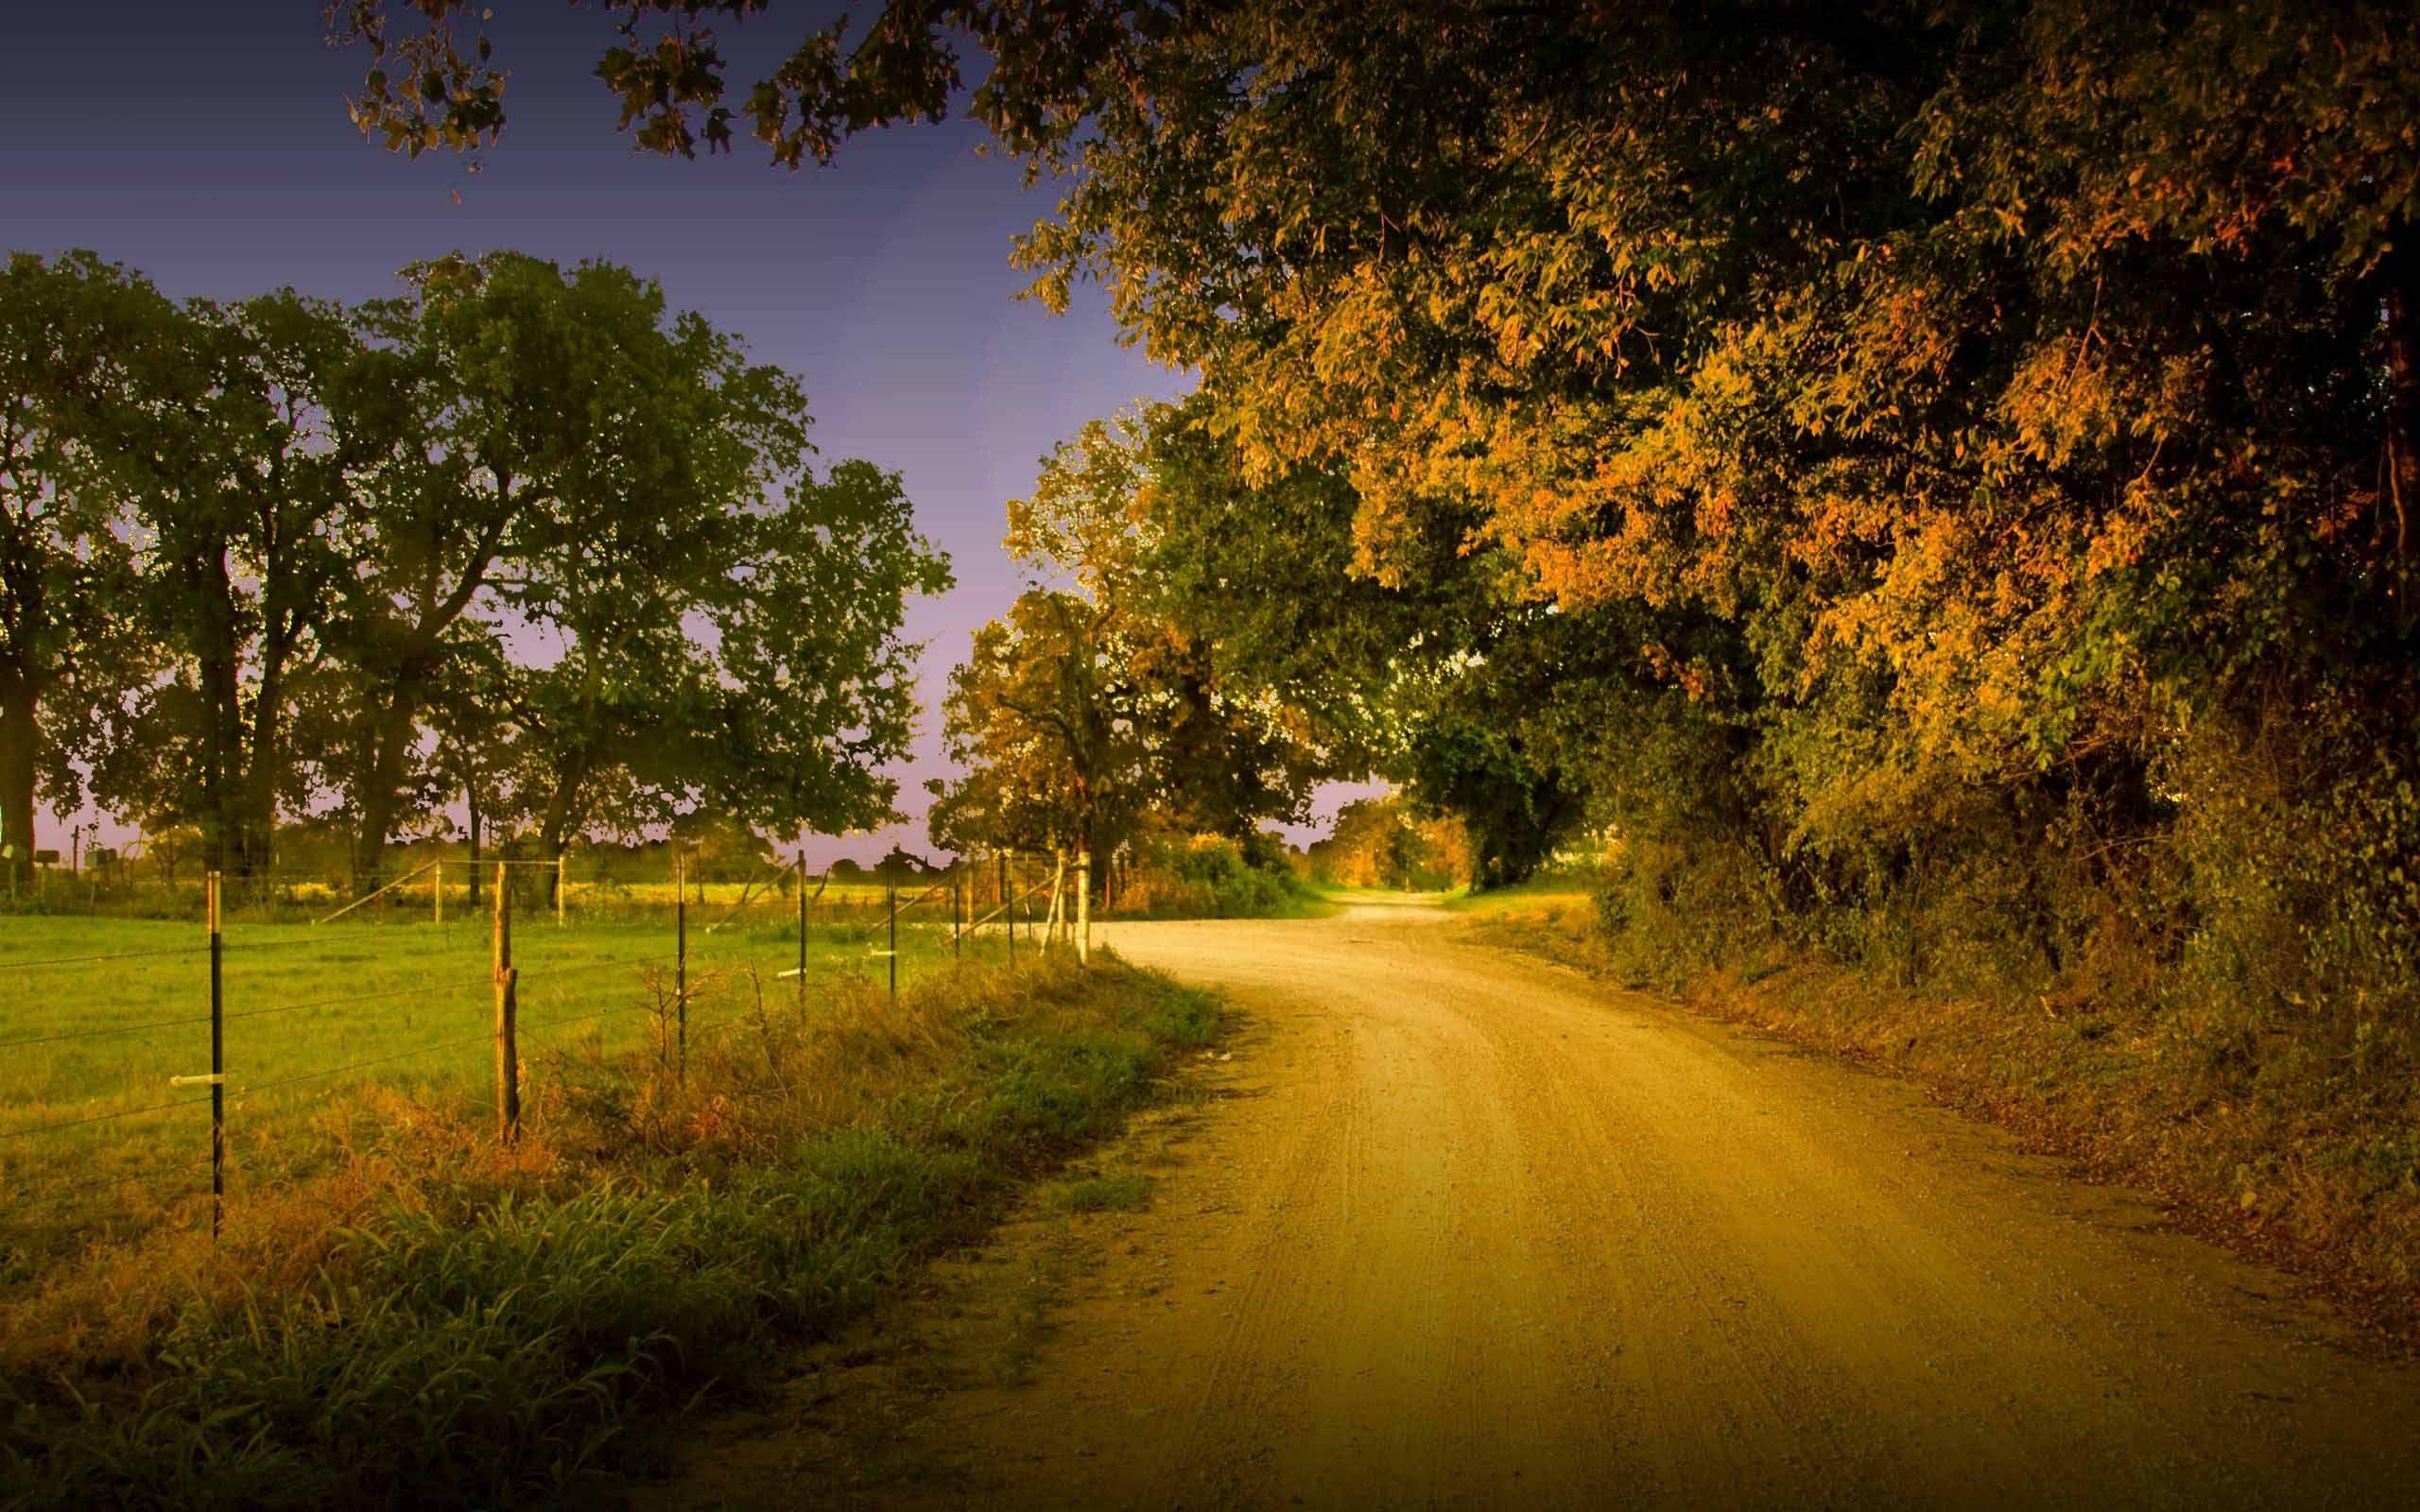 Scenic Roads Wallpaper Scenic Road Wallpapers Hd Wallpapers Fan Full Hd Wallpapers 1080p Scenic Roads Country Roads Scenic